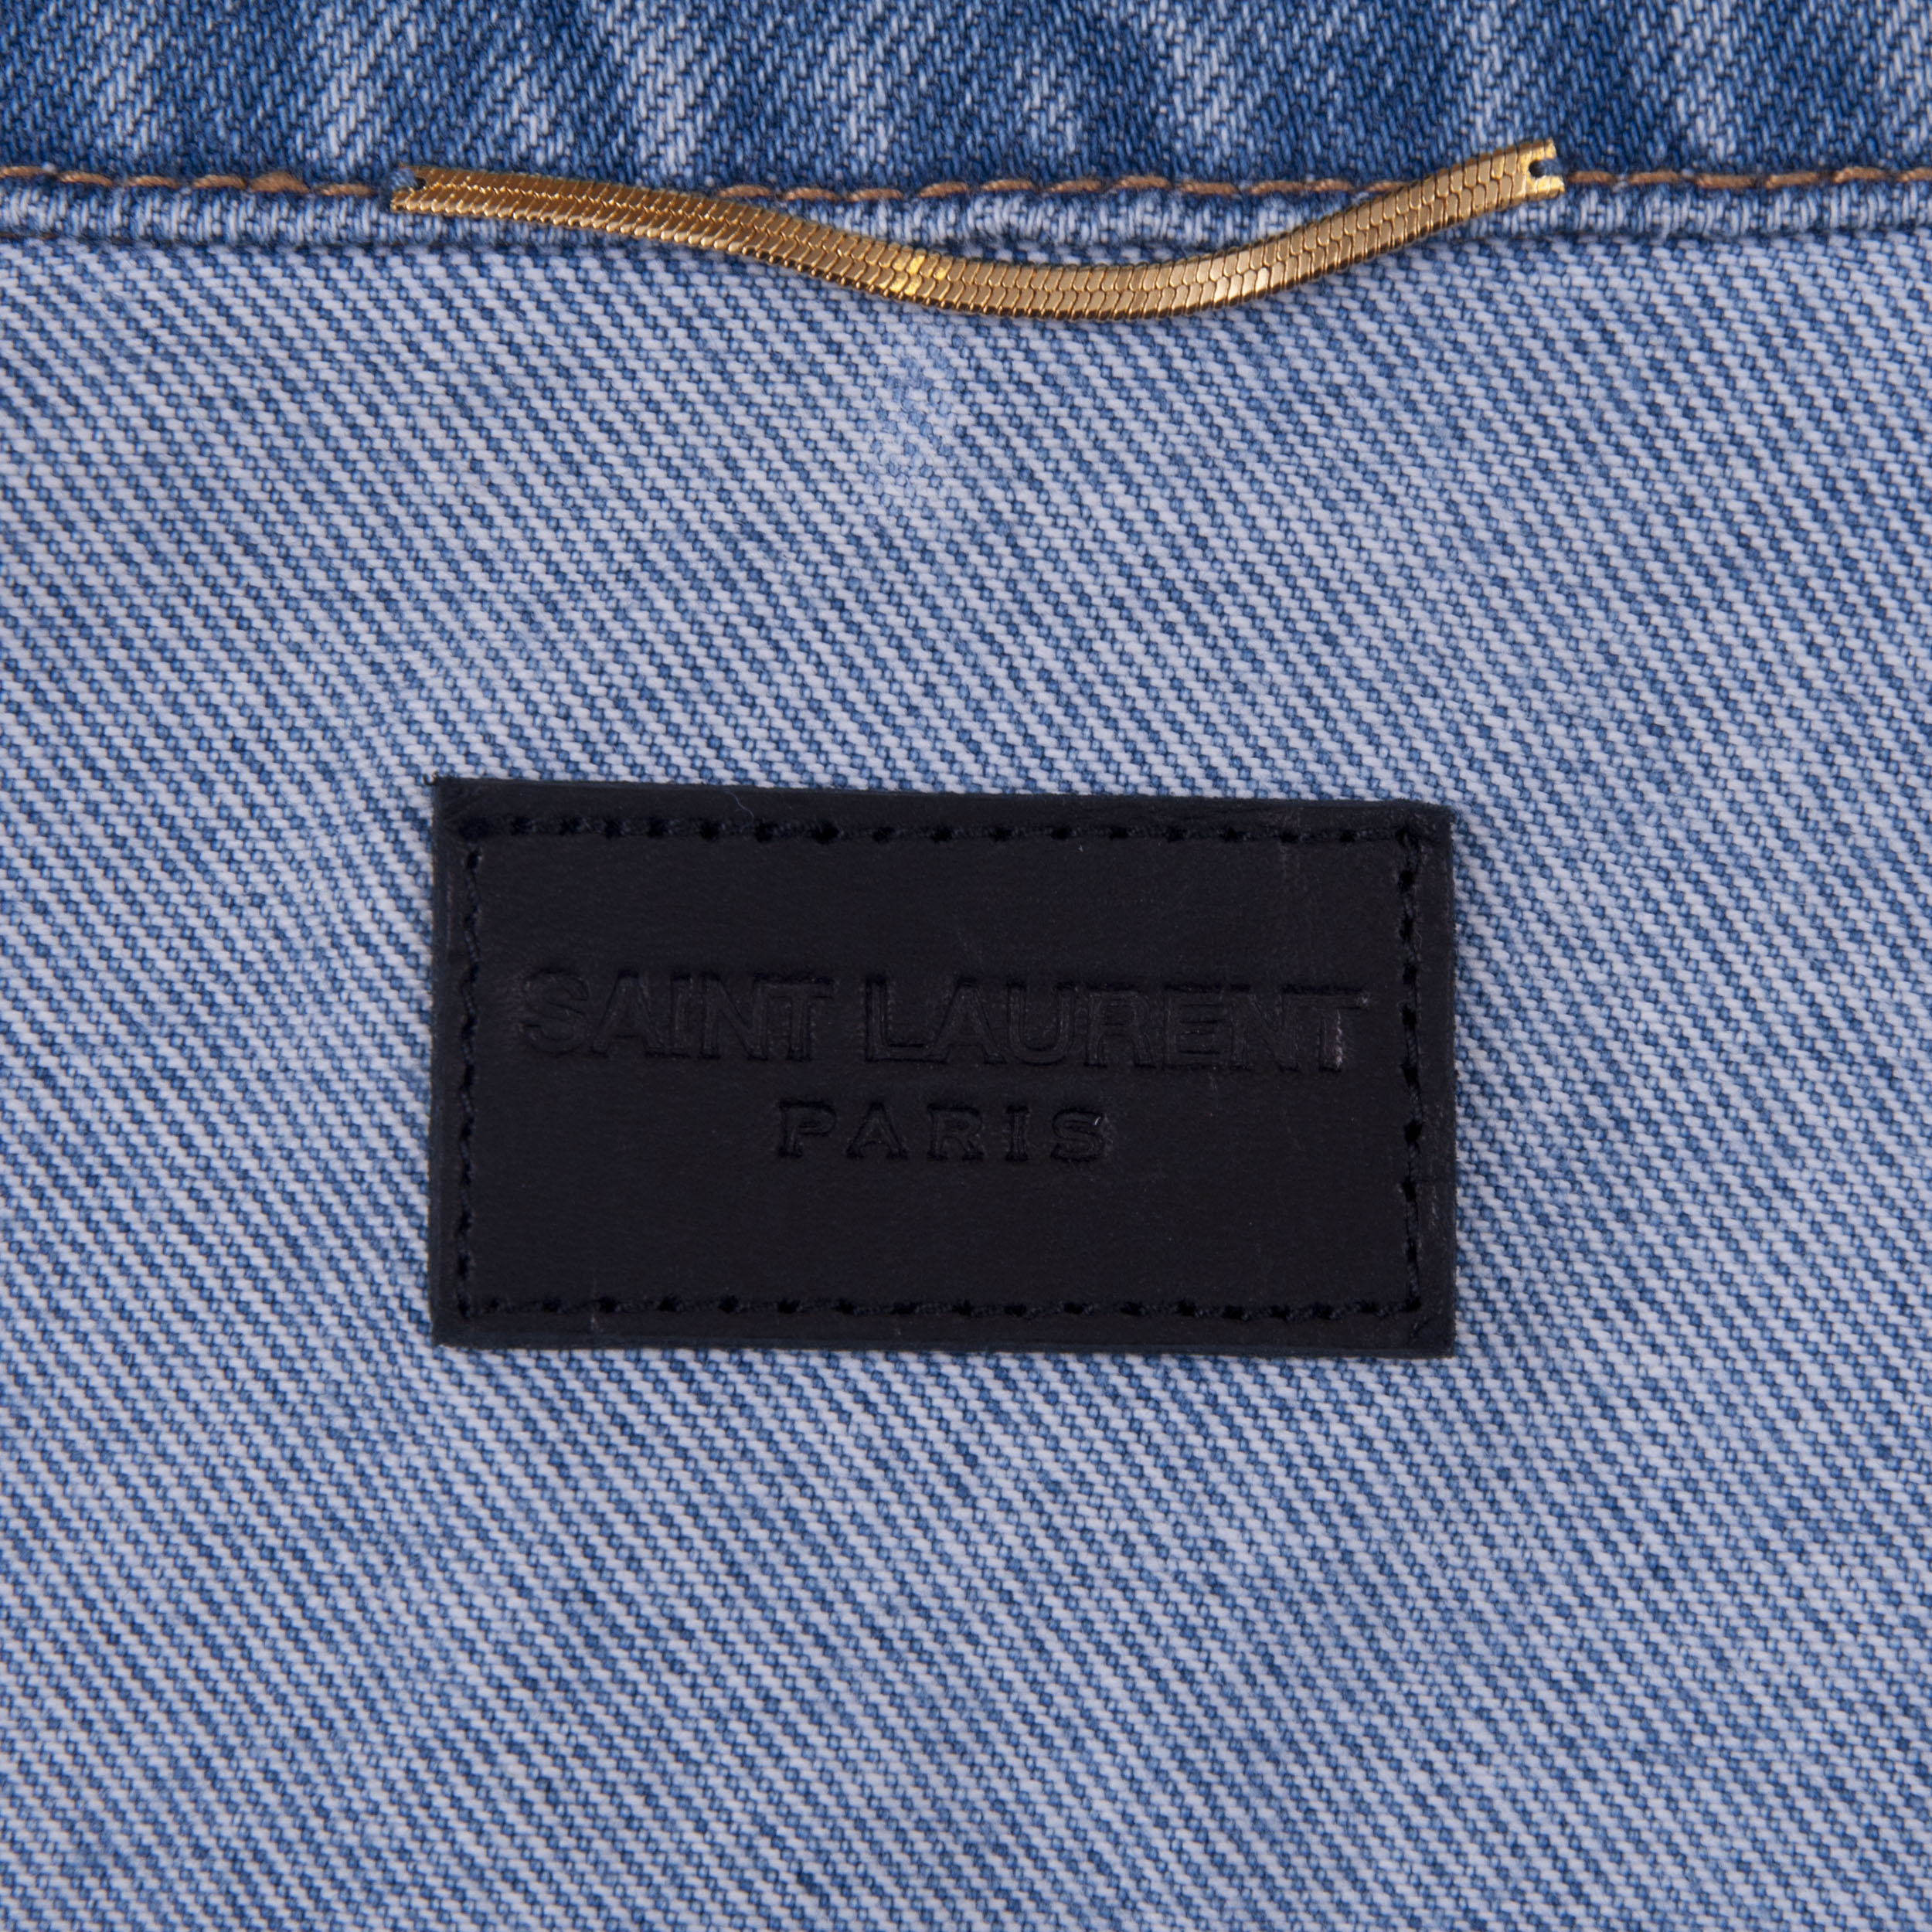 b4ab6d3939 SAINT LAURENT PARIS 1490$ Oversized Loulou Embroidery Jacket In ...